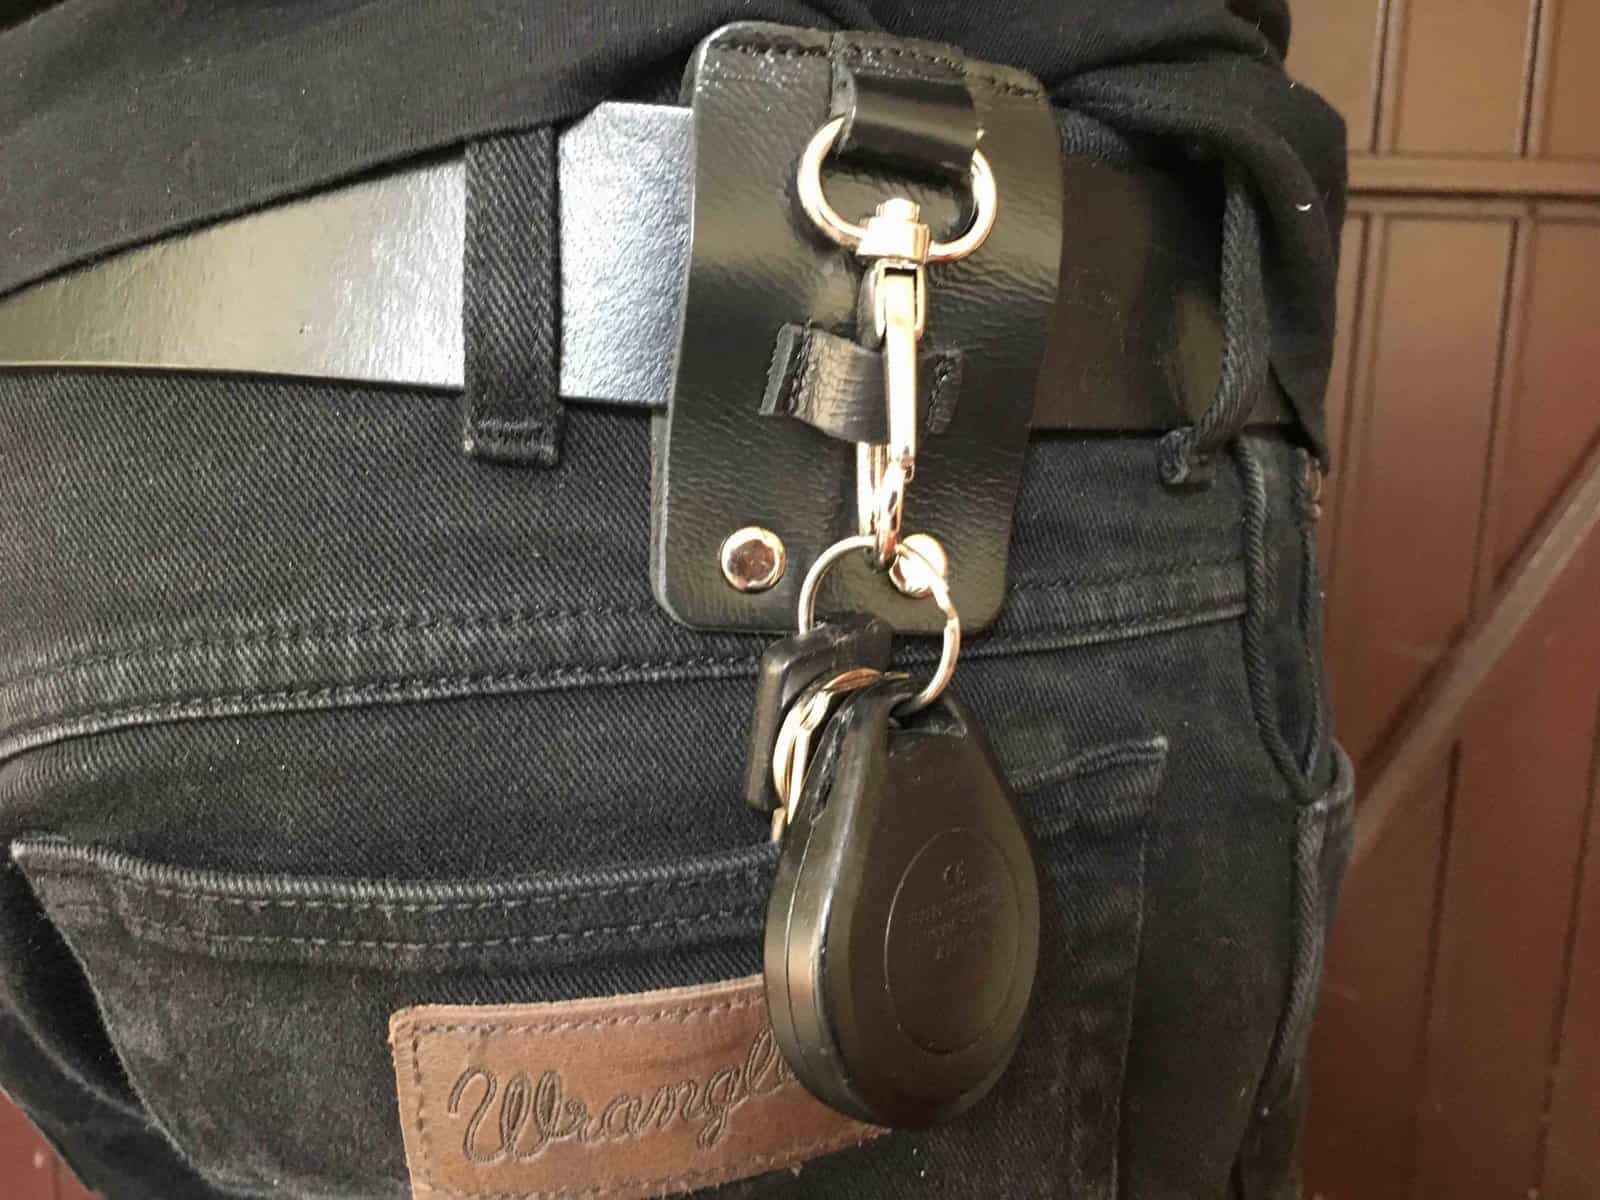 Handmade Leather Belt Key Holder And Key Fob: Save £5